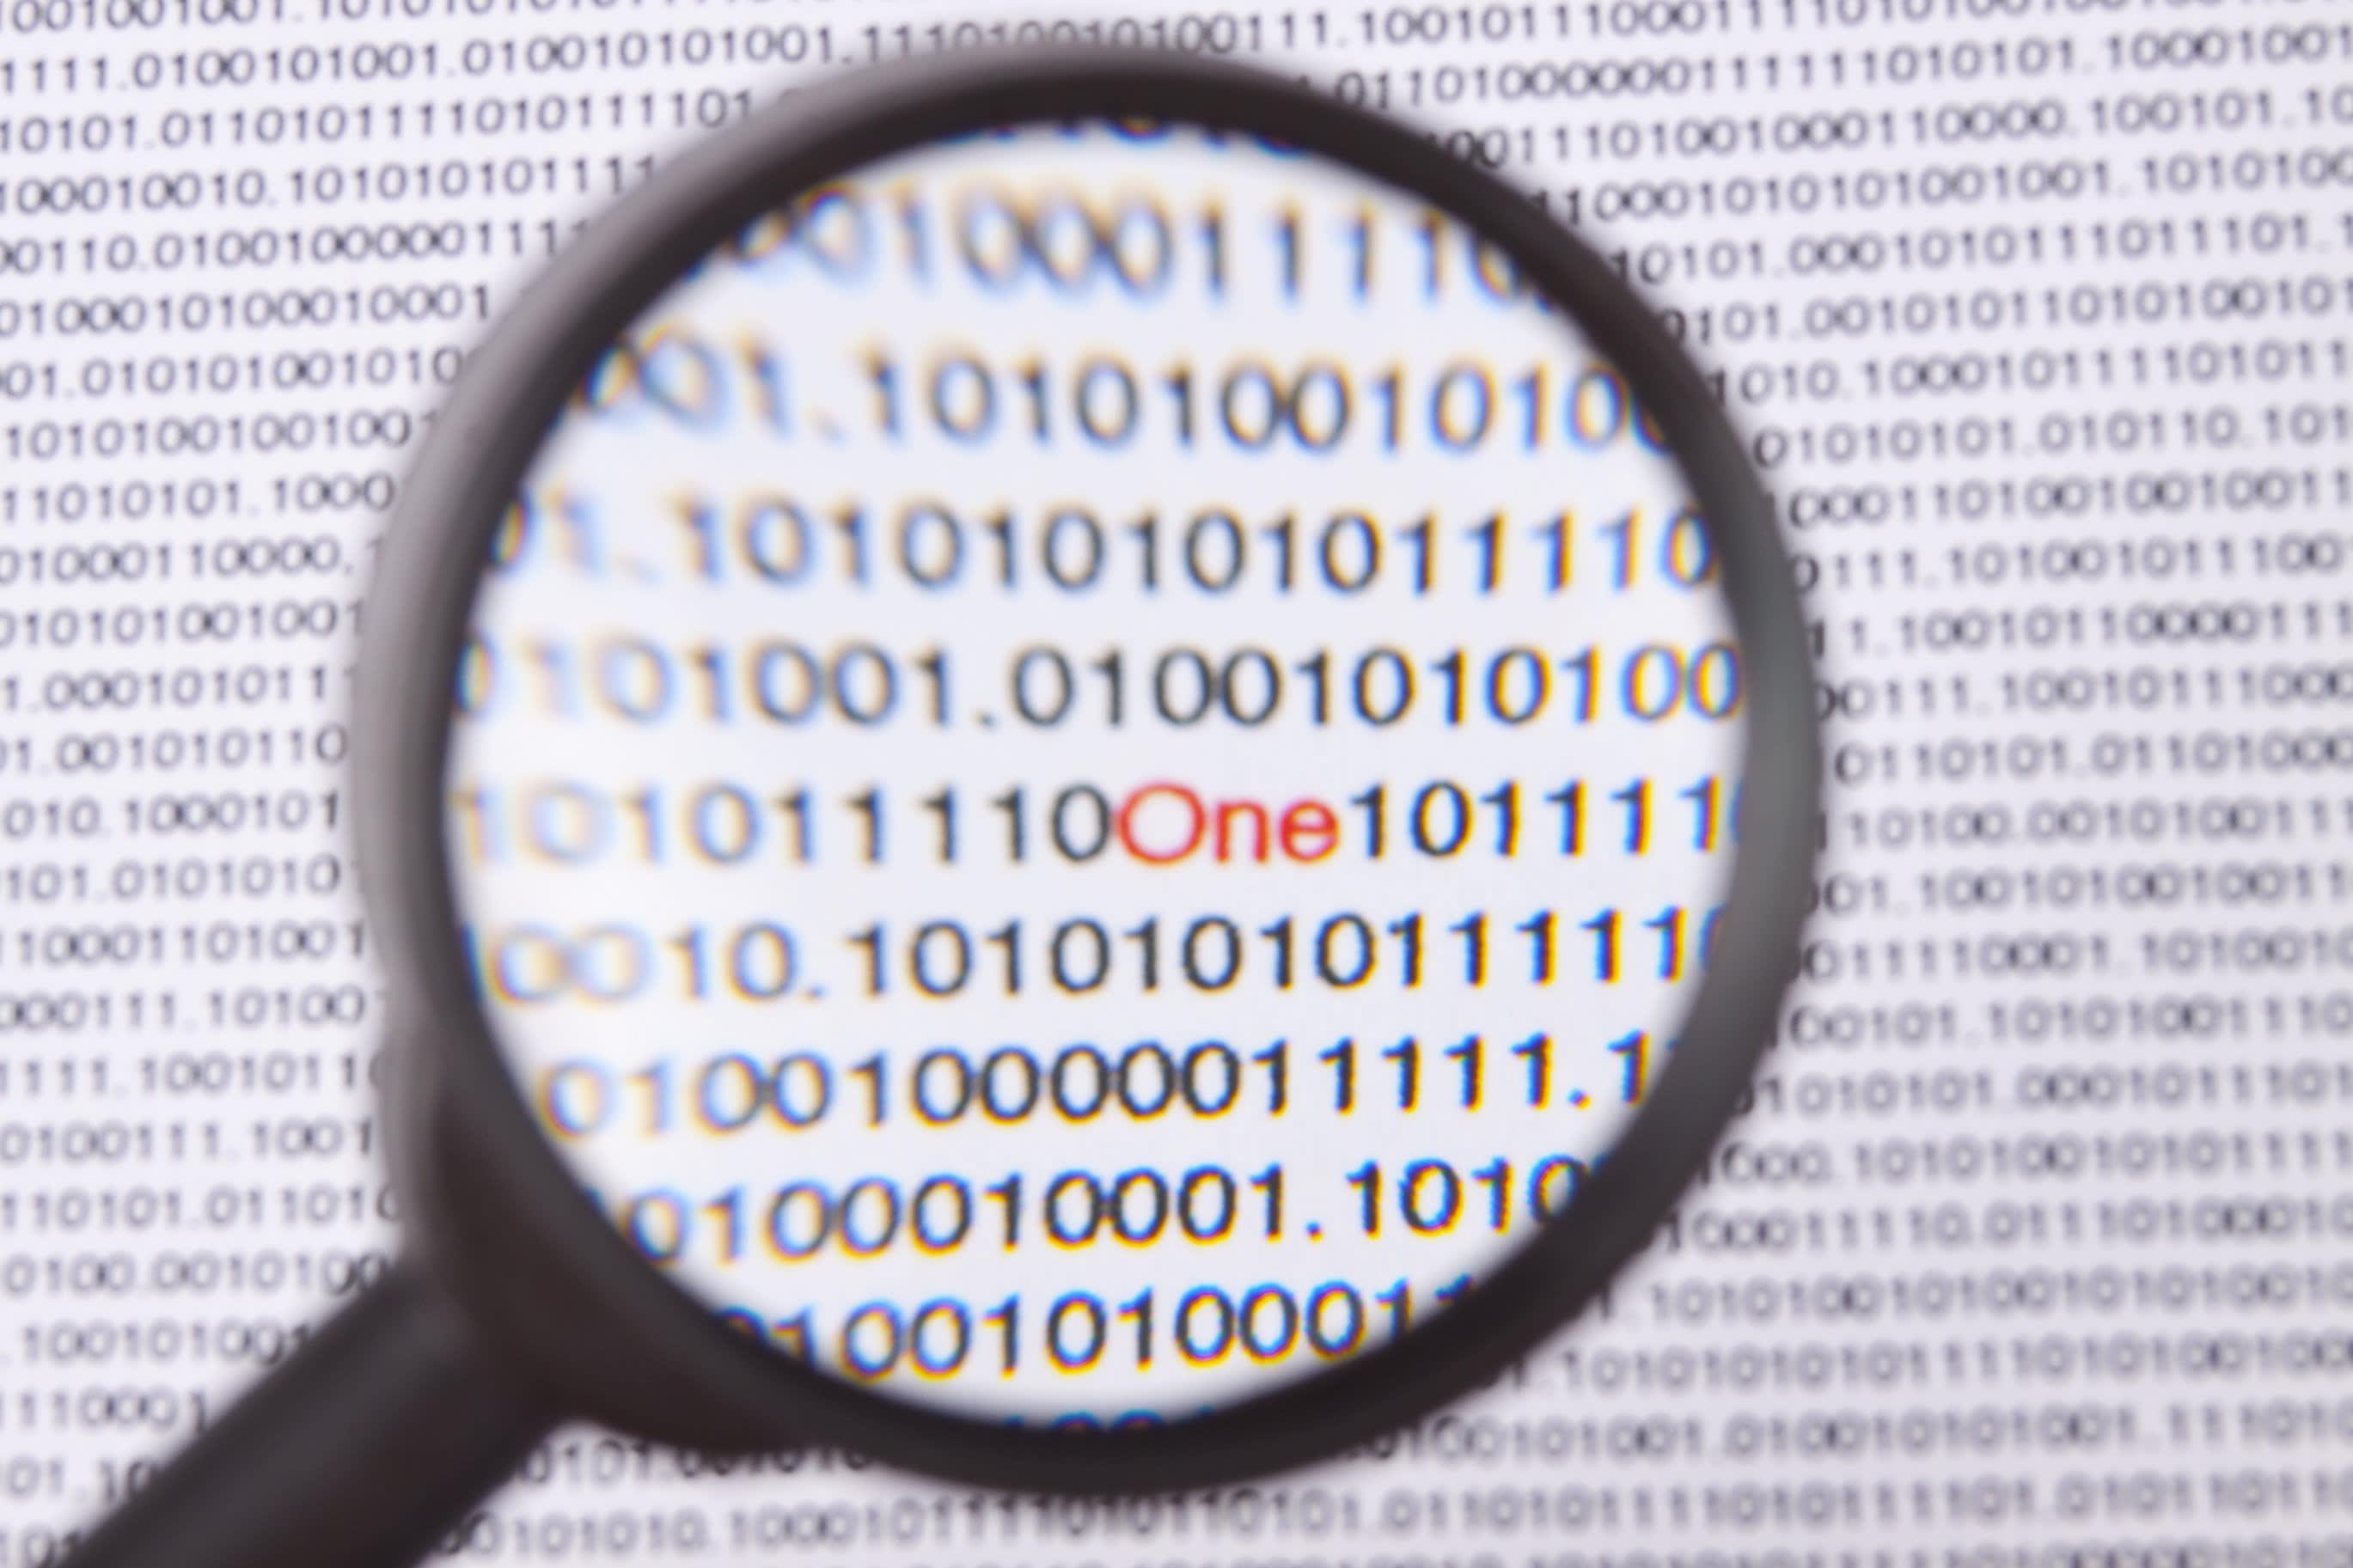 Bargain shares: Exploiting information voids